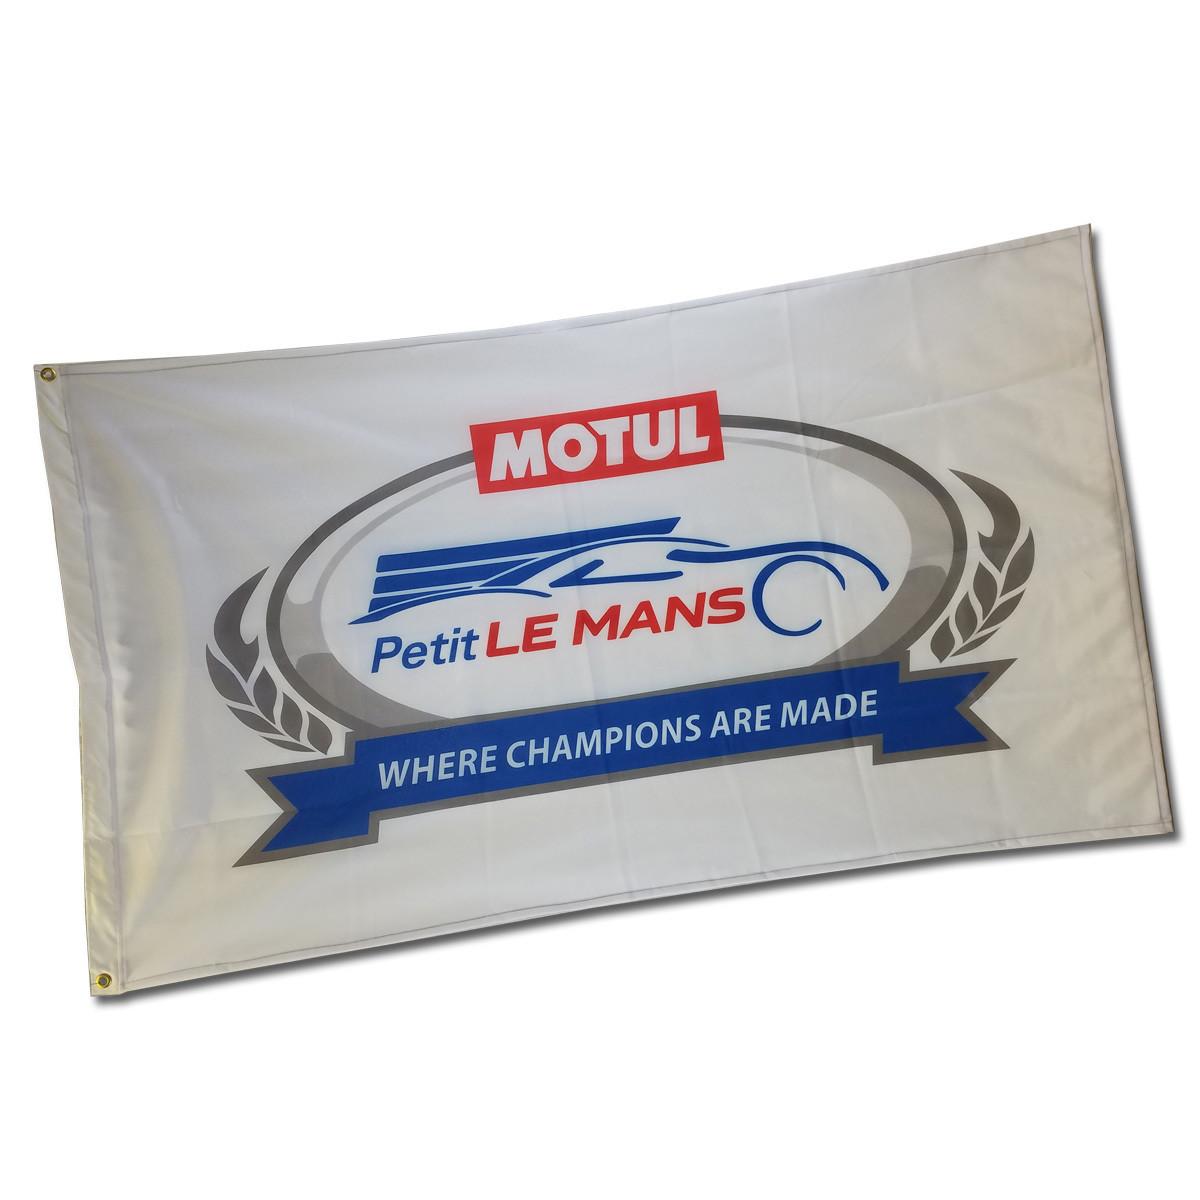 Motul Petit Le Mans Flag Grommet